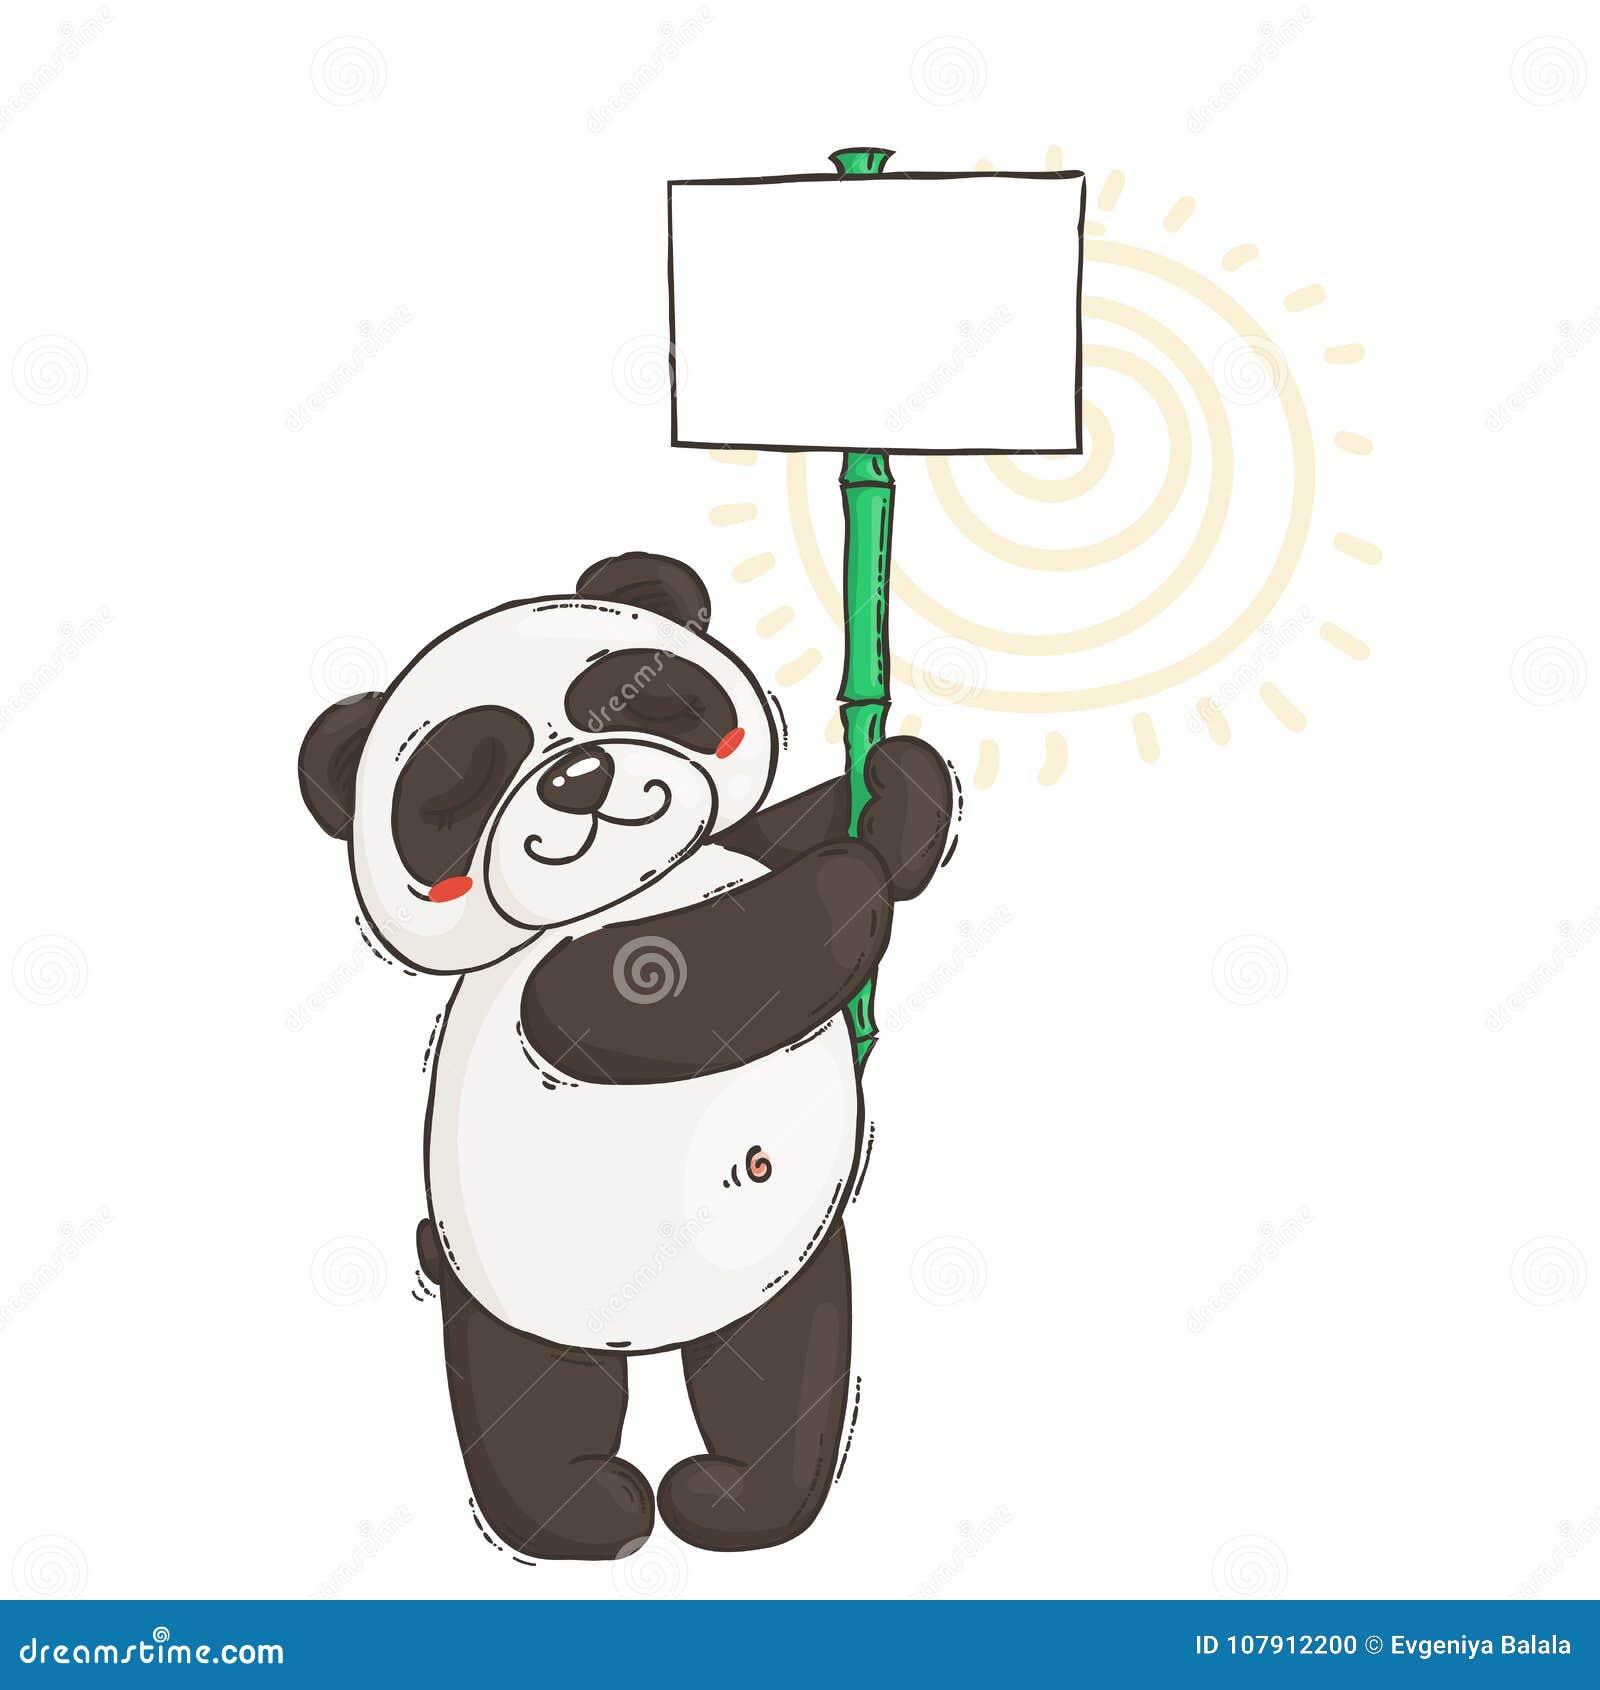 Bamboo stick cartoon stock illustrations